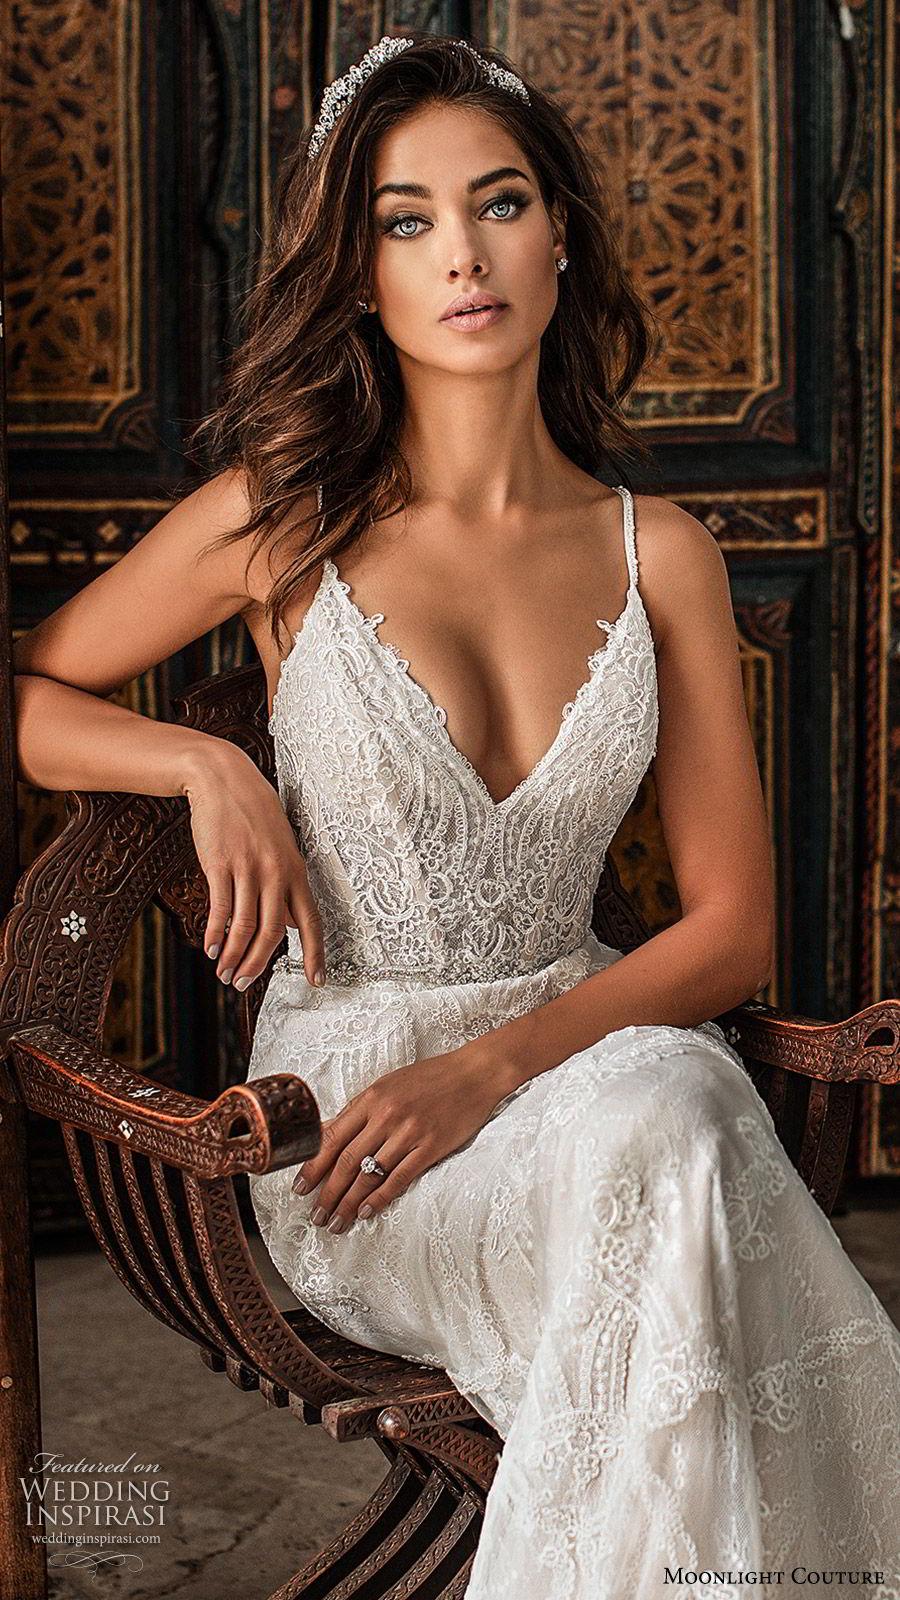 moonlight couture fall 2019 bridal sleeveless thin straps v neckling fully embellished lace sheath wedding dress (5) glam elegant sophisticated chapel train low back zv